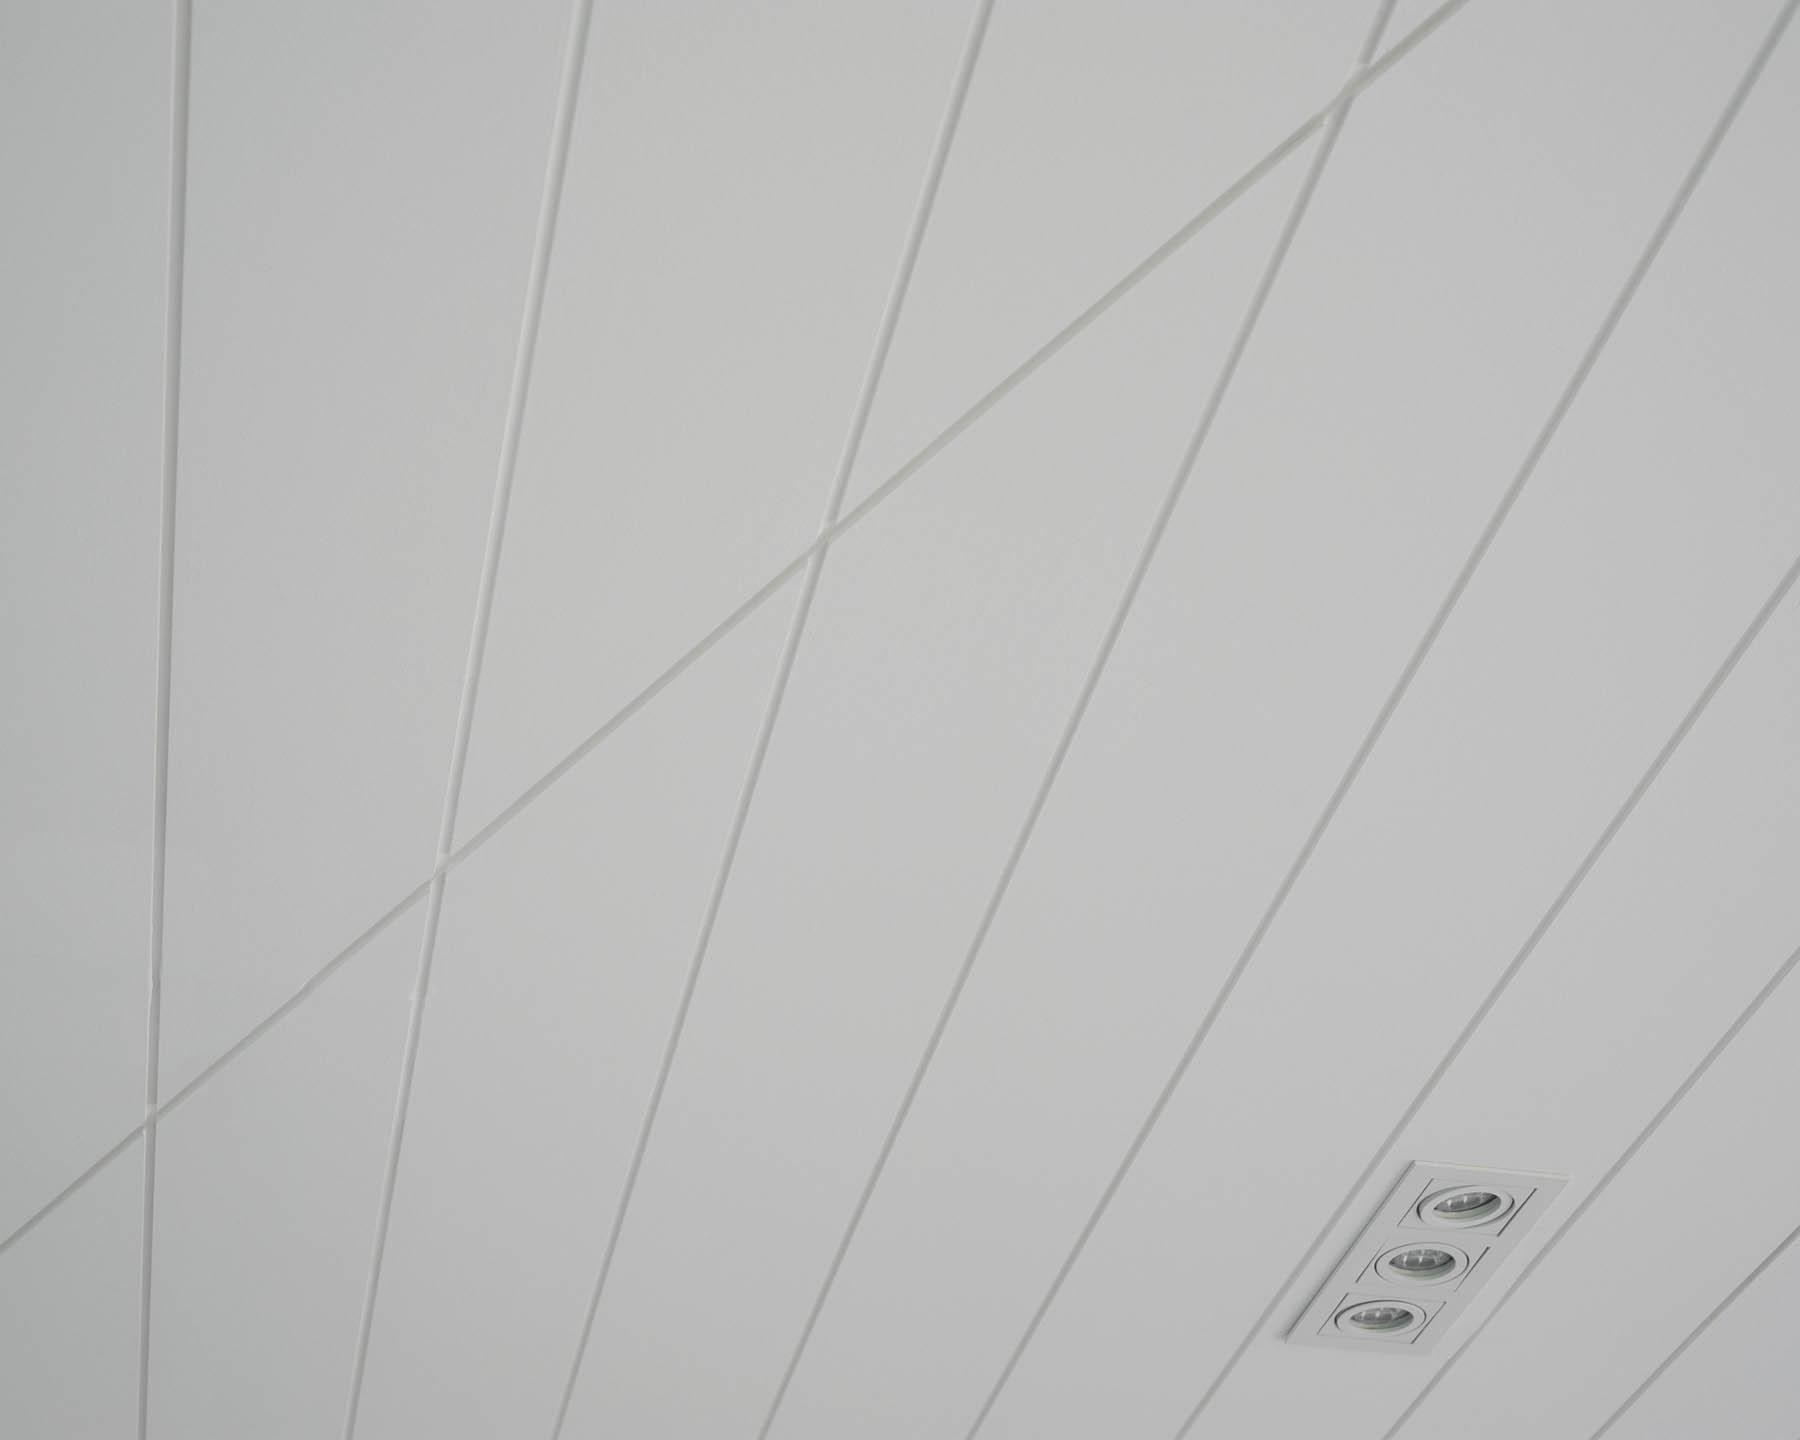 AMAT-0141-0045.jpg